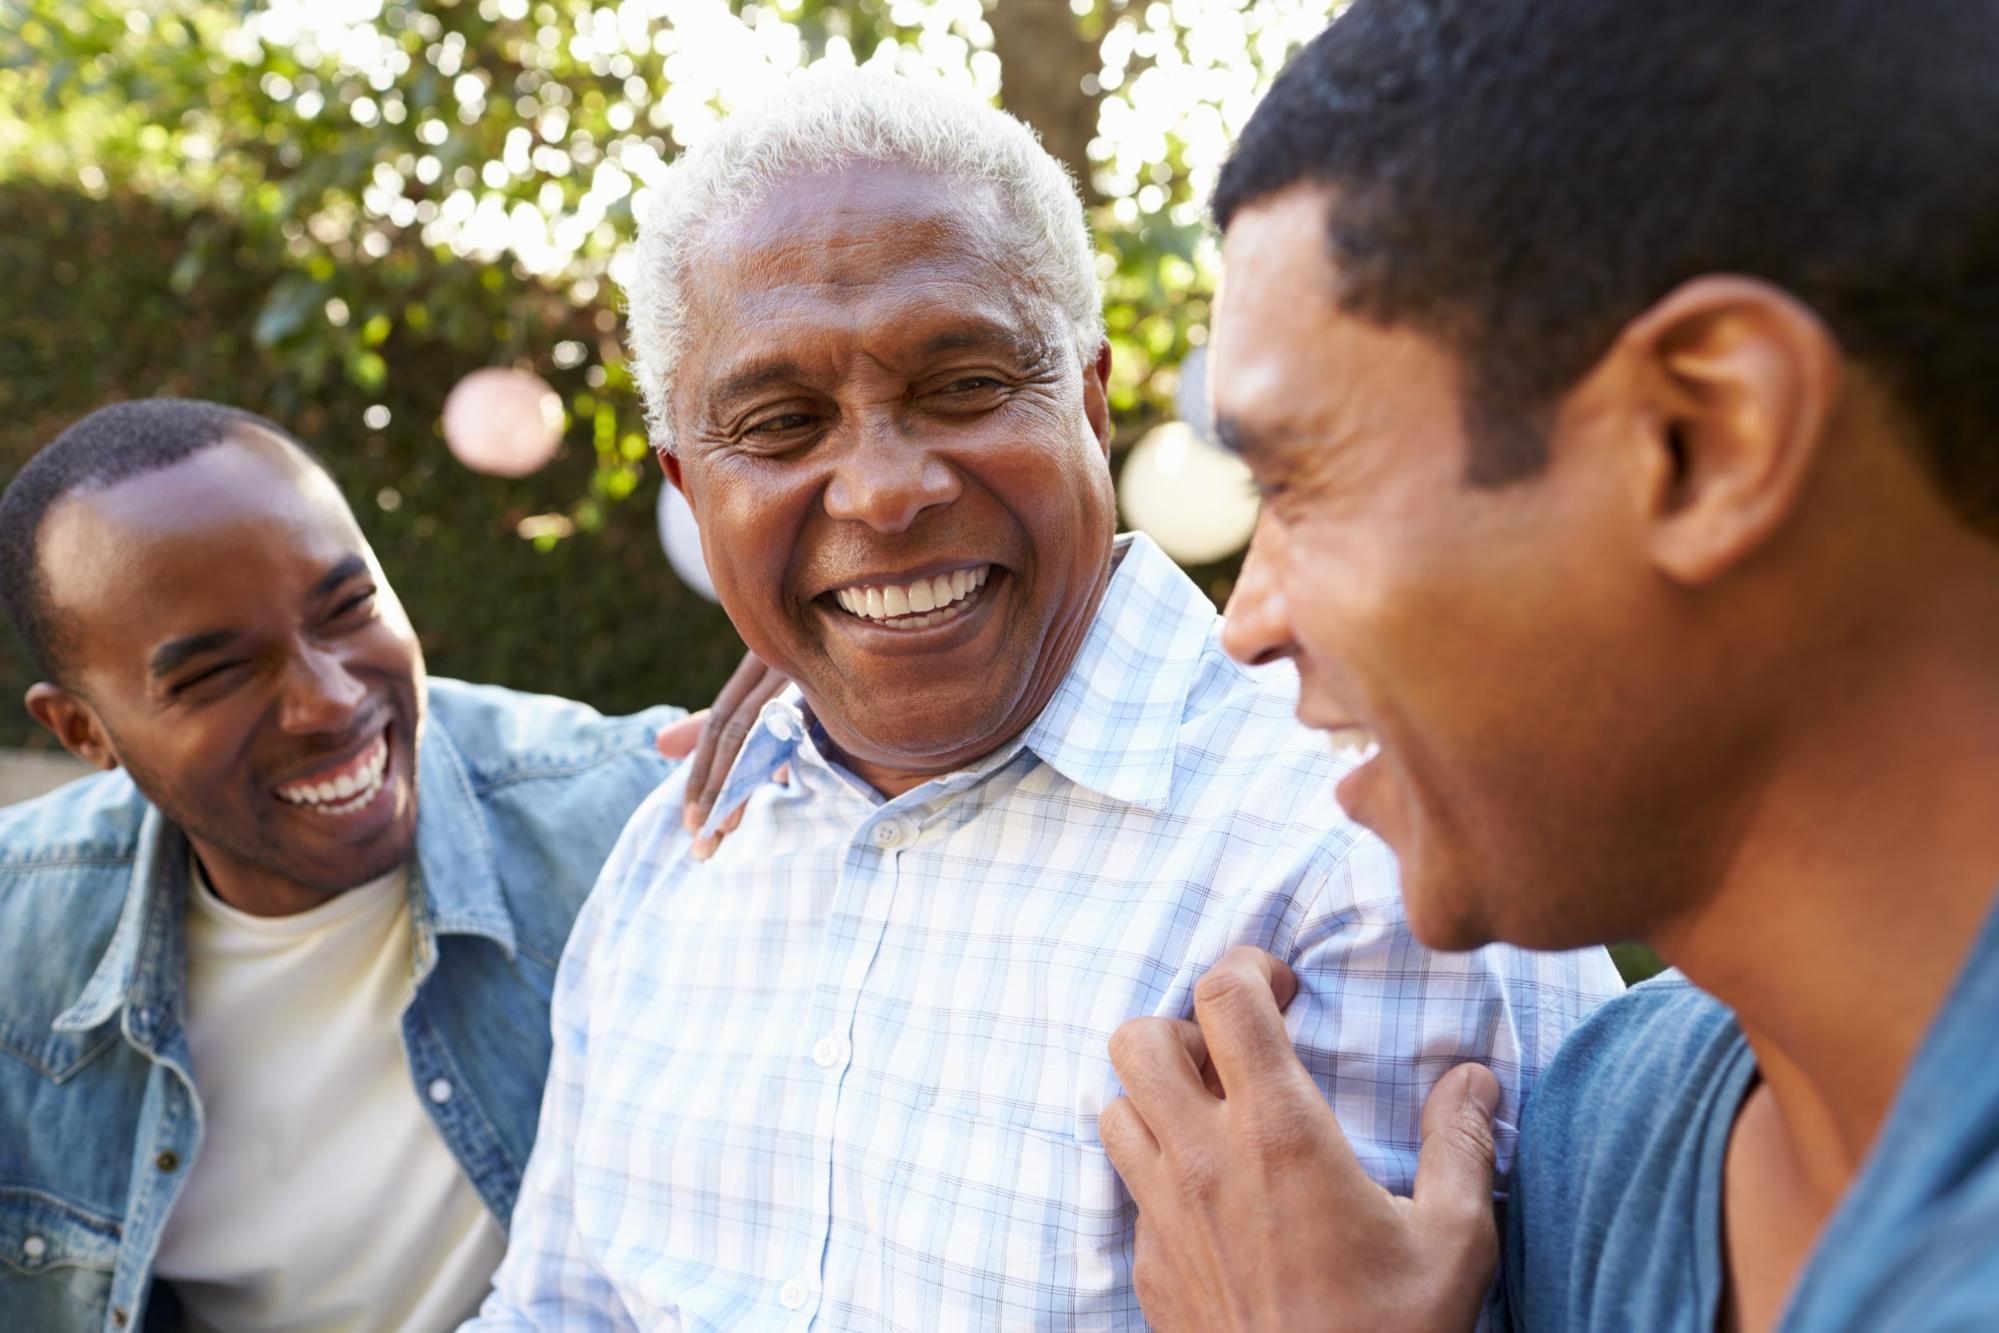 When a Parent's Short-Term Rehab Becomes Long-Term Care